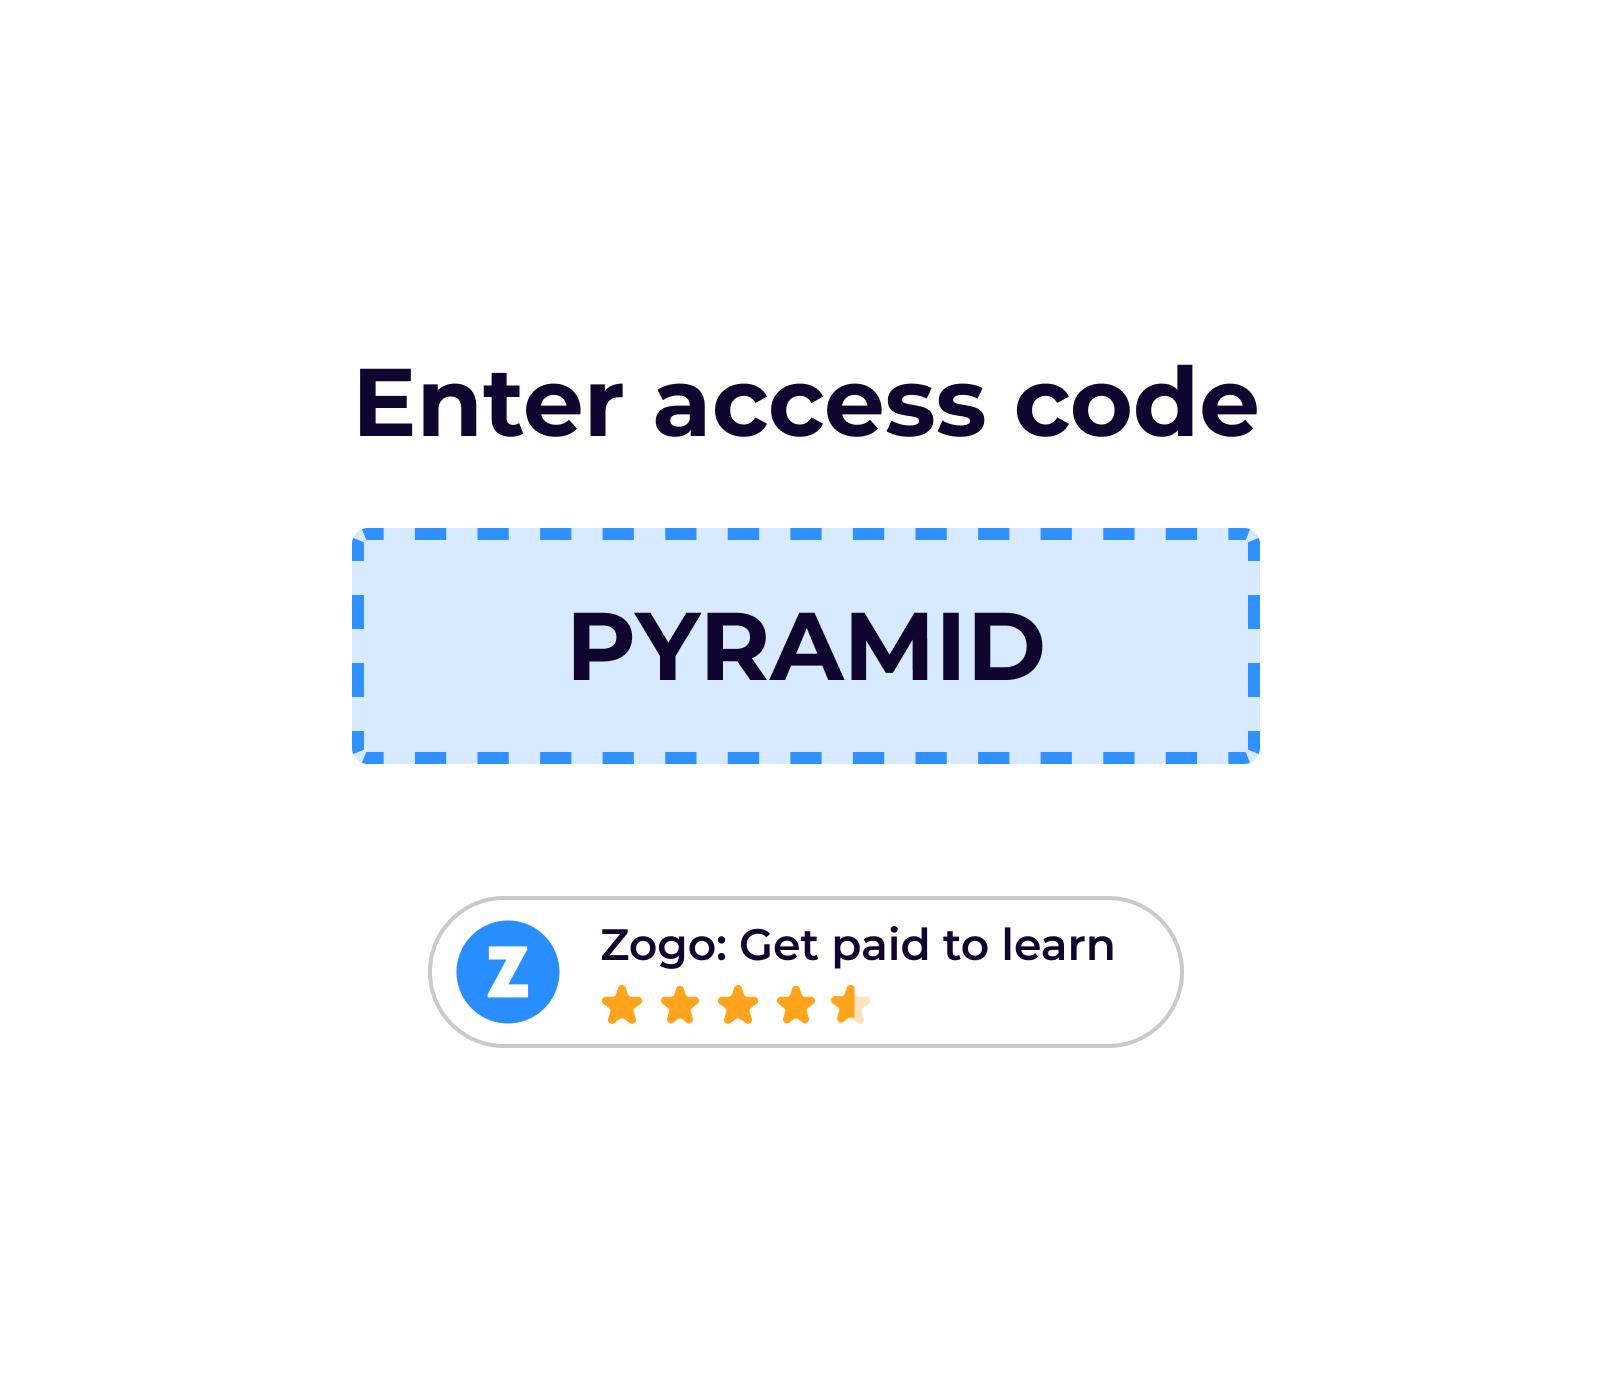 PYRAMIDAccessCode.png